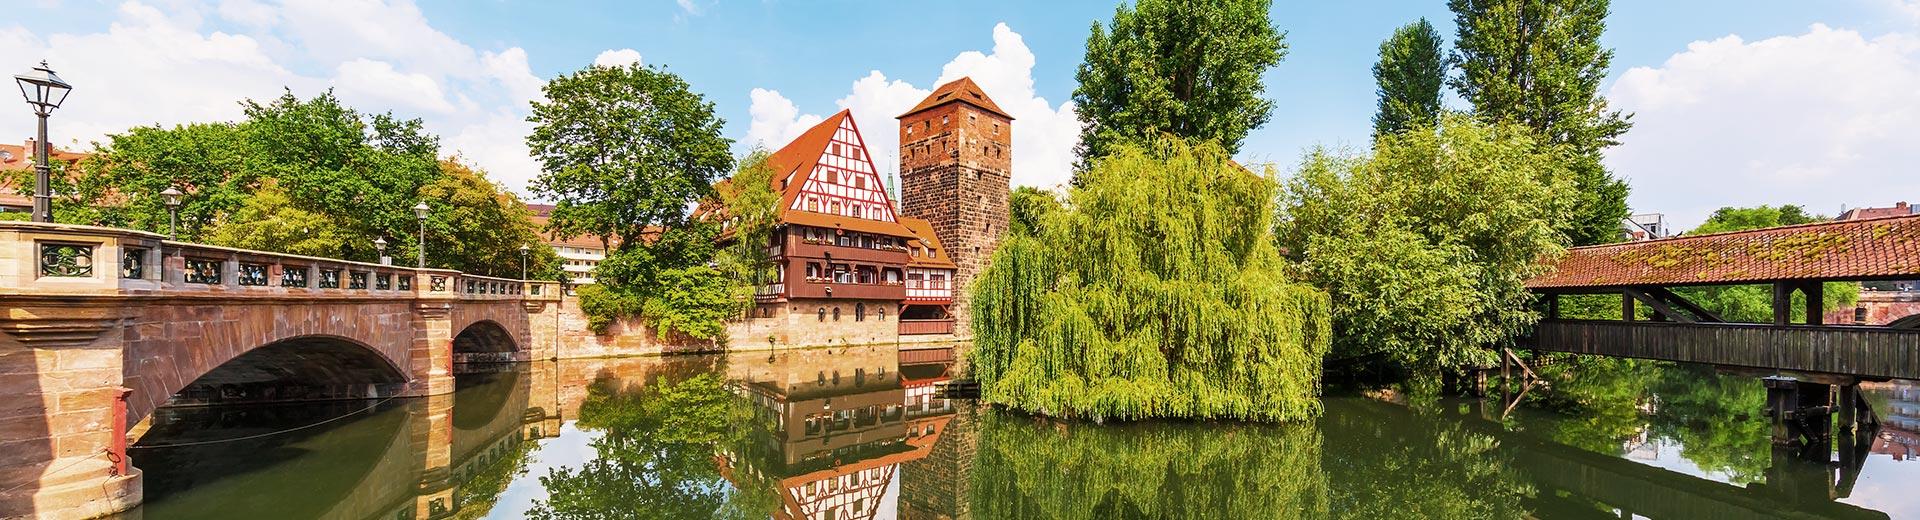 Städtereise Nürnberg